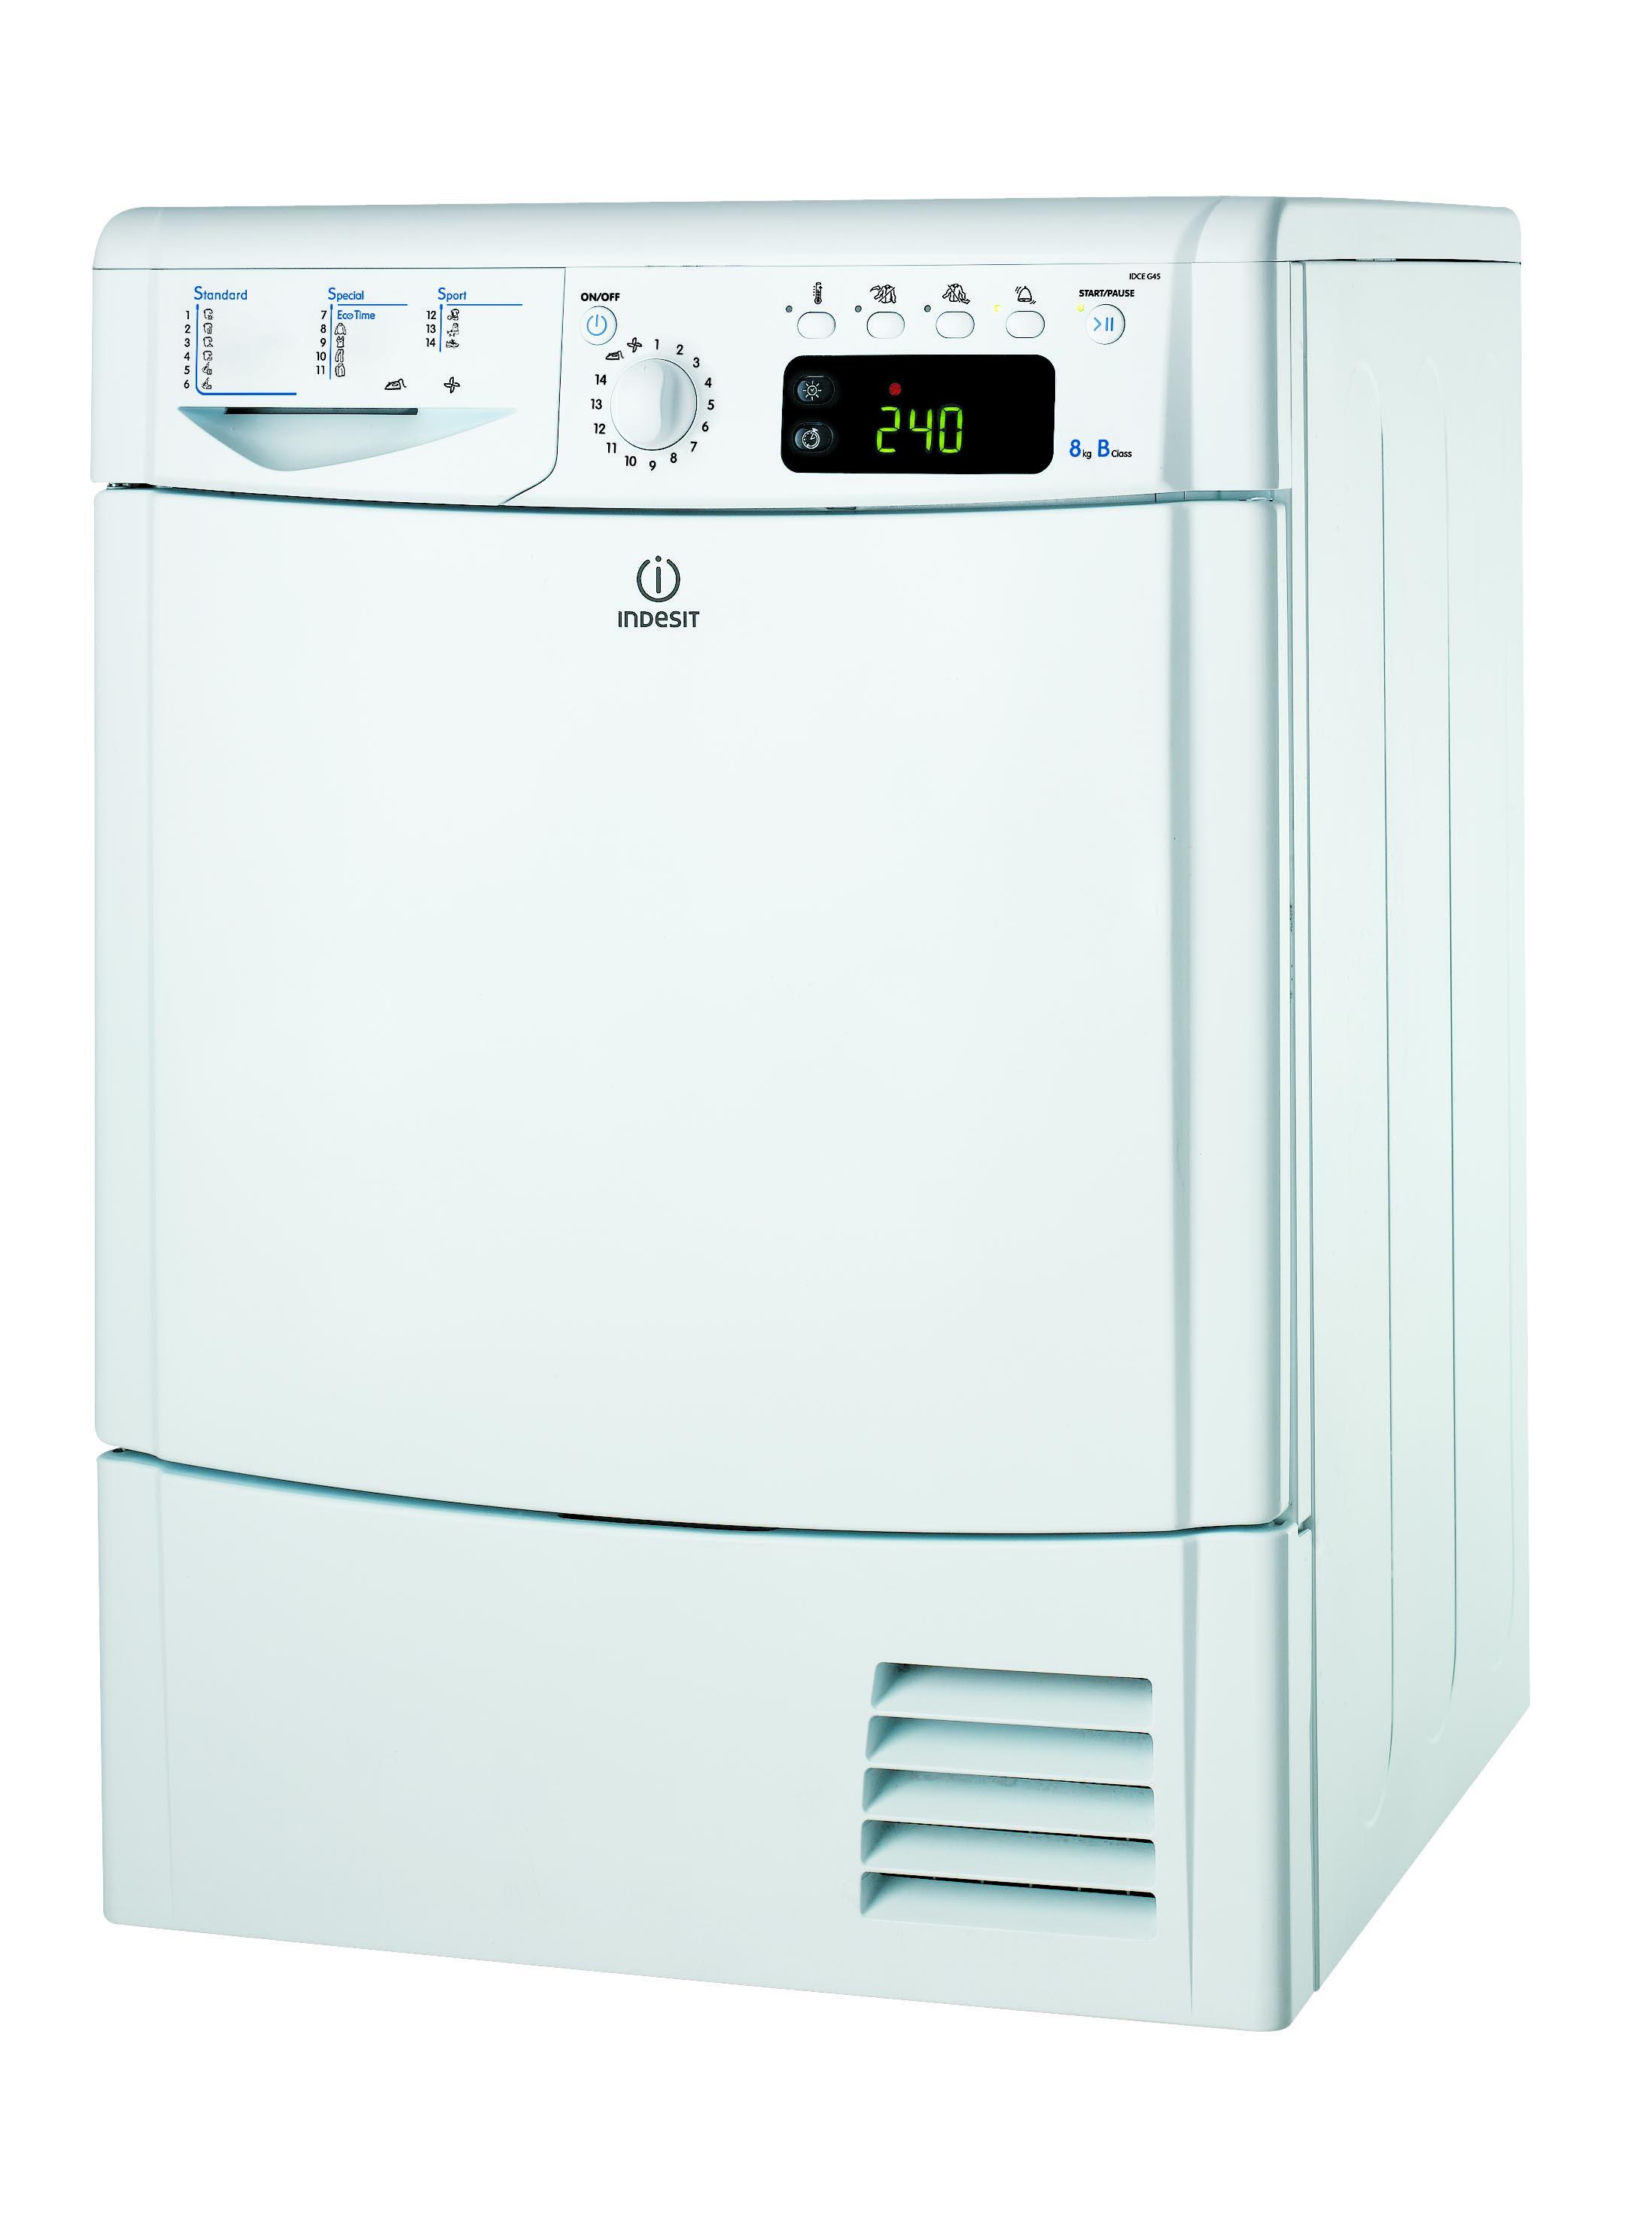 Indesit IDCE G45 B (EU) KURUTMA MAKİNESİ Çamaşır Makinesi